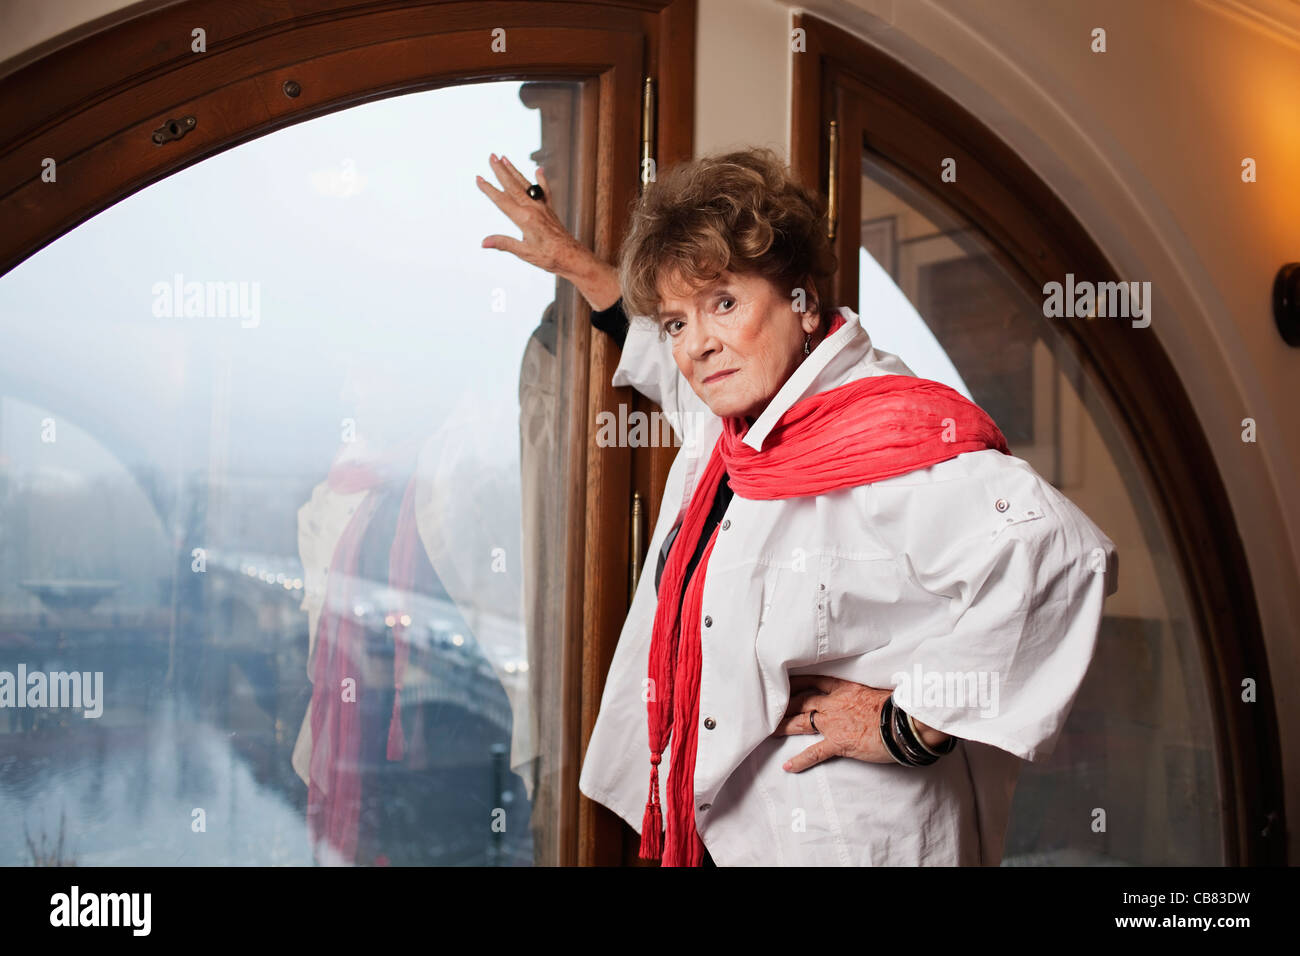 Edith Johnson,Aishwarya Sakhuja 2010 Hot video Constanze Saemann GER,Kim Cattrall (born 1956 (Anglo-Canadian)